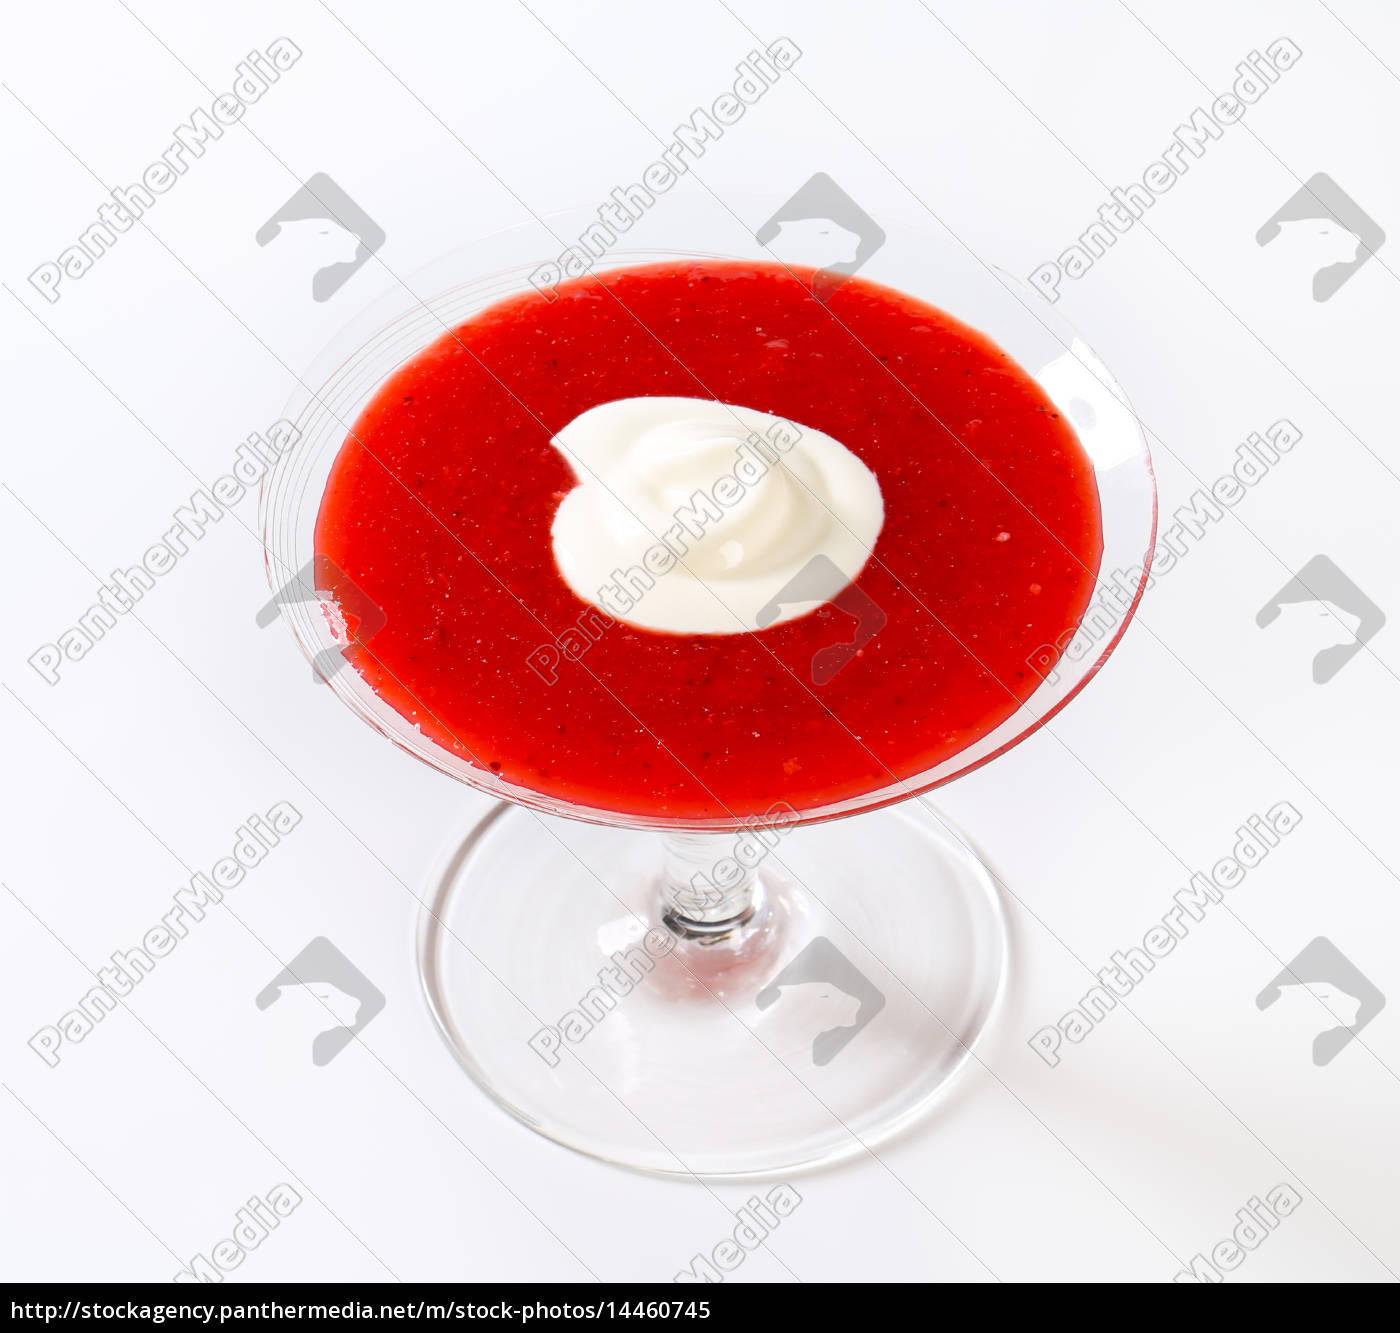 strawberry, puree, with, cream - 14460745